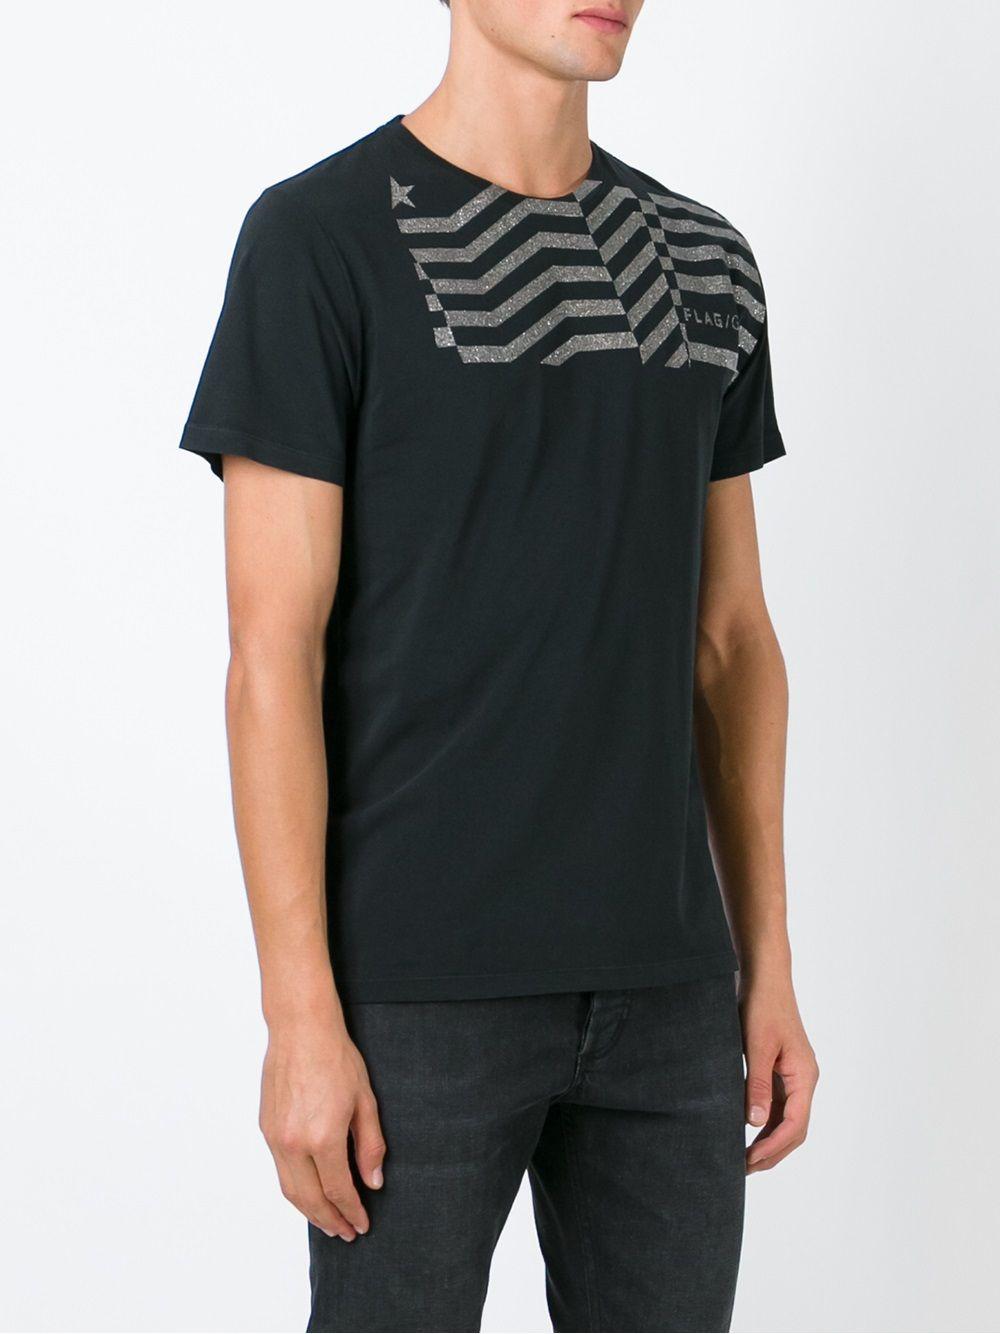 Black cotton gold glitter stripe detail T-shirt   GGDB |  | G27U527.A2NERO